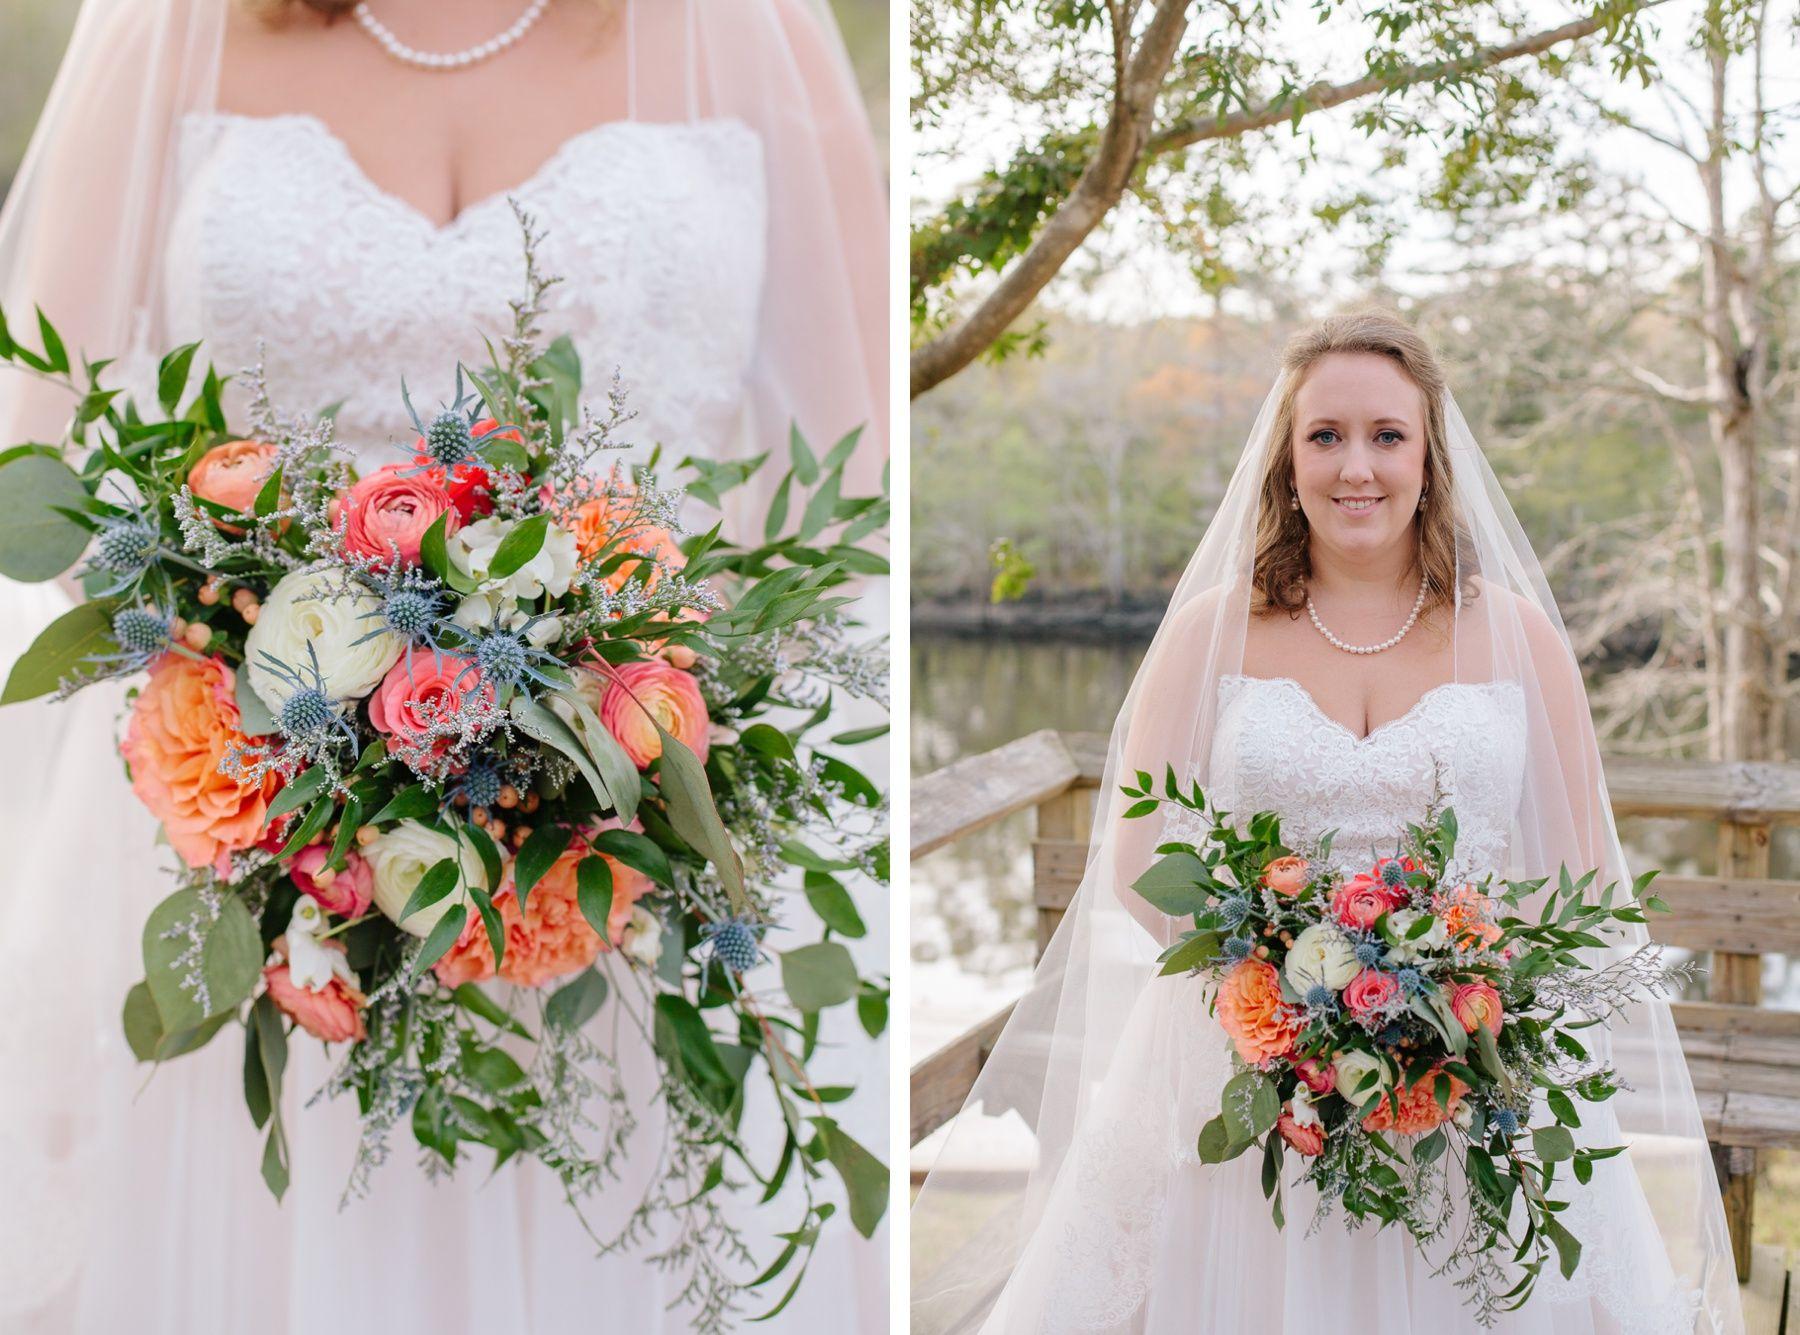 Beautiful Bridal Portraits With Stunning Bouquet Givhans Ferry State Park Wedding Charleston Photographer